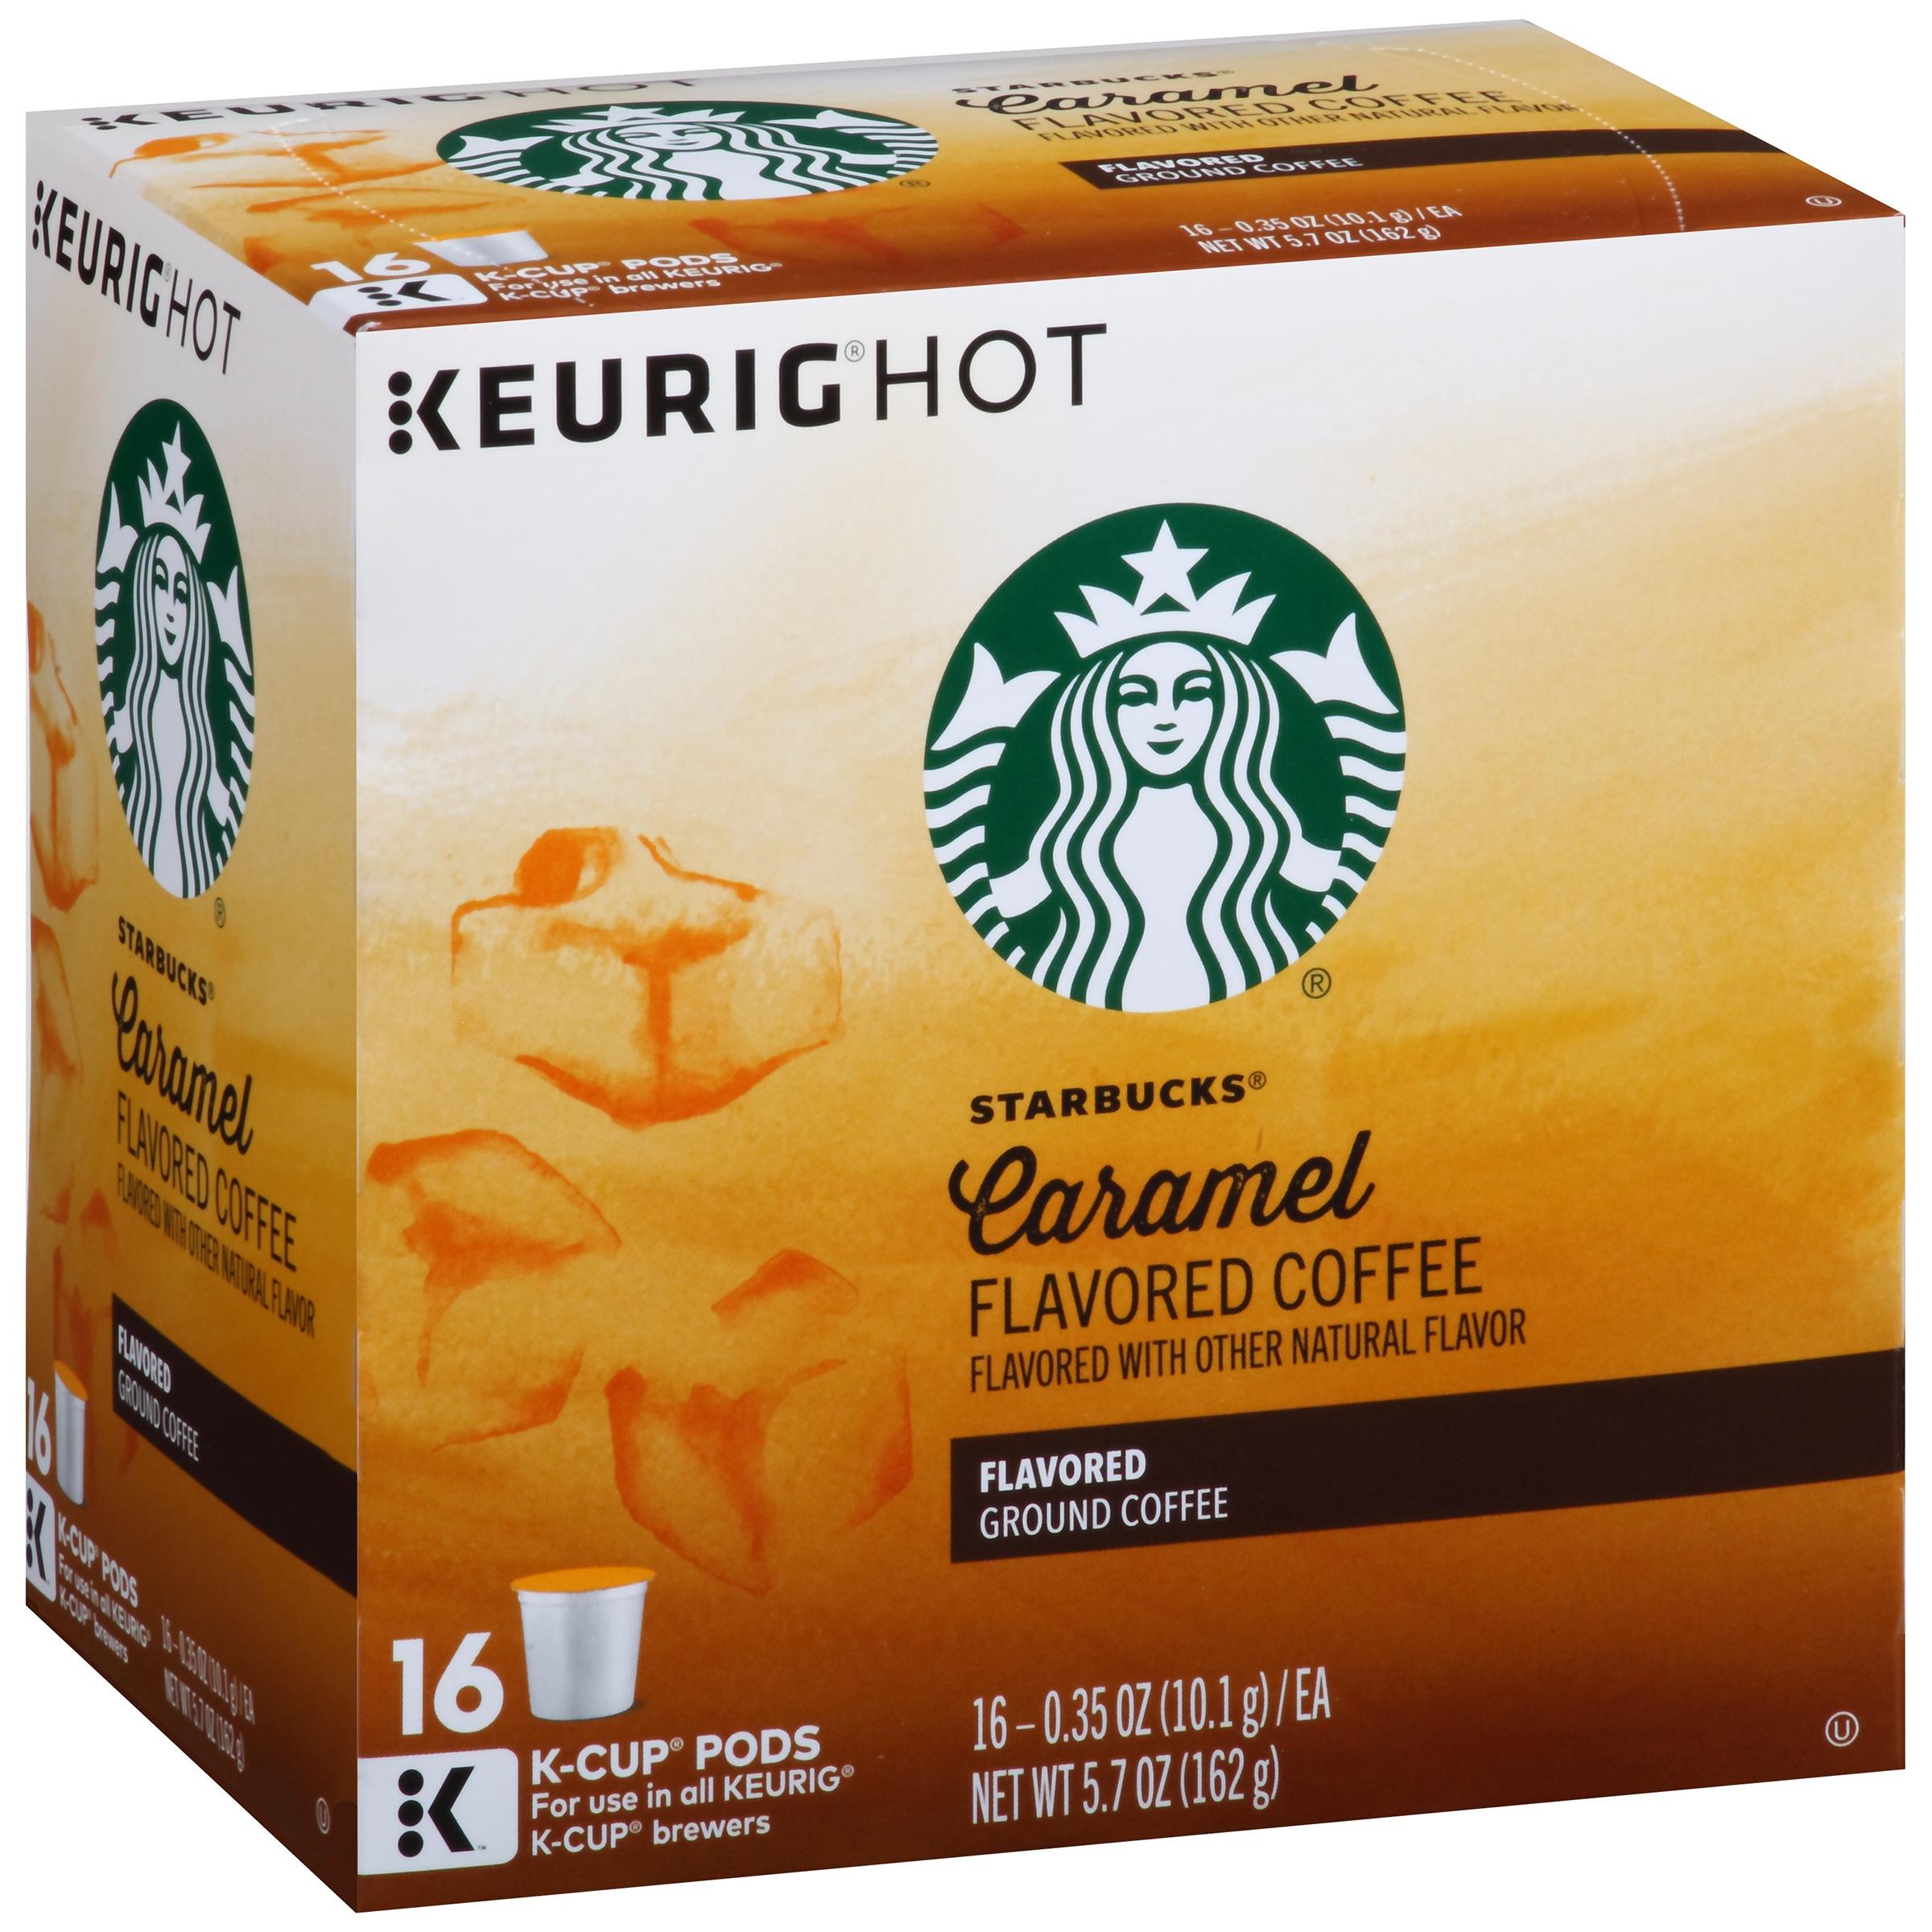 Starbucks Caramel Coffee K-cups, 0.35 oz, 16 ct